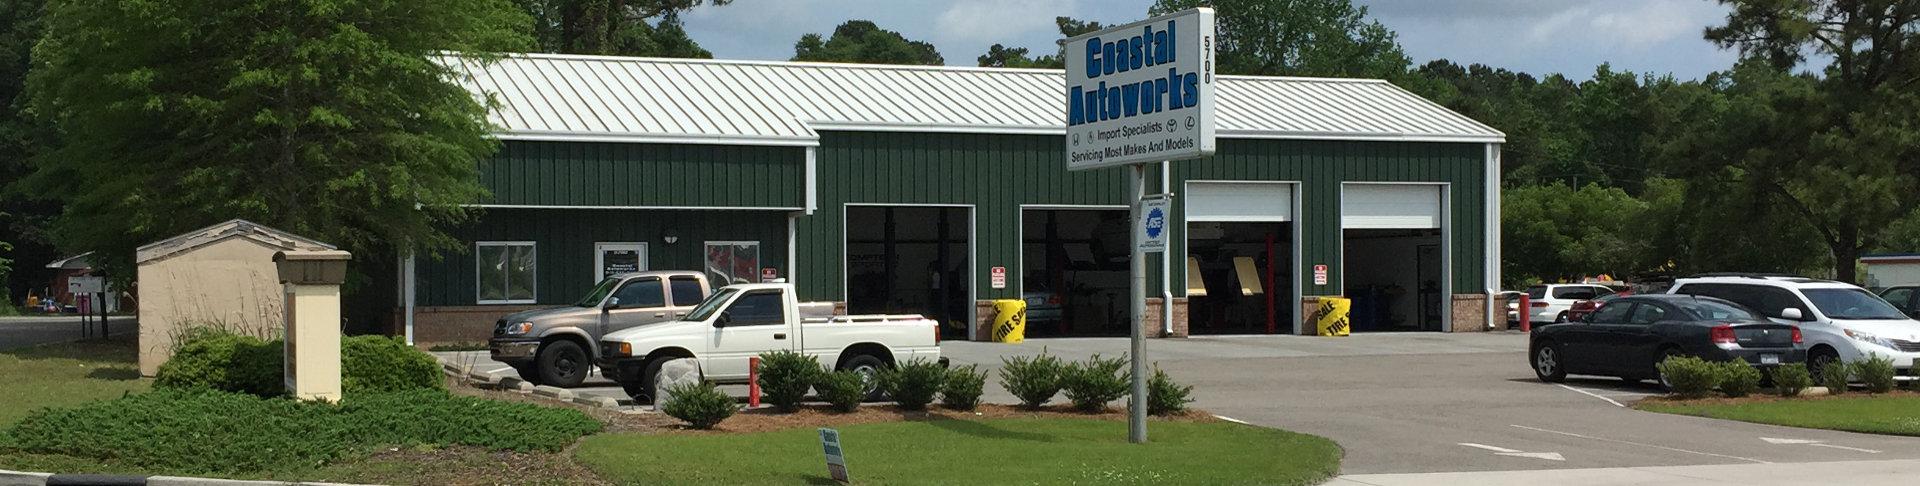 Auto repair wilmington nc coastal auto works for Honda dealership wilmington nc